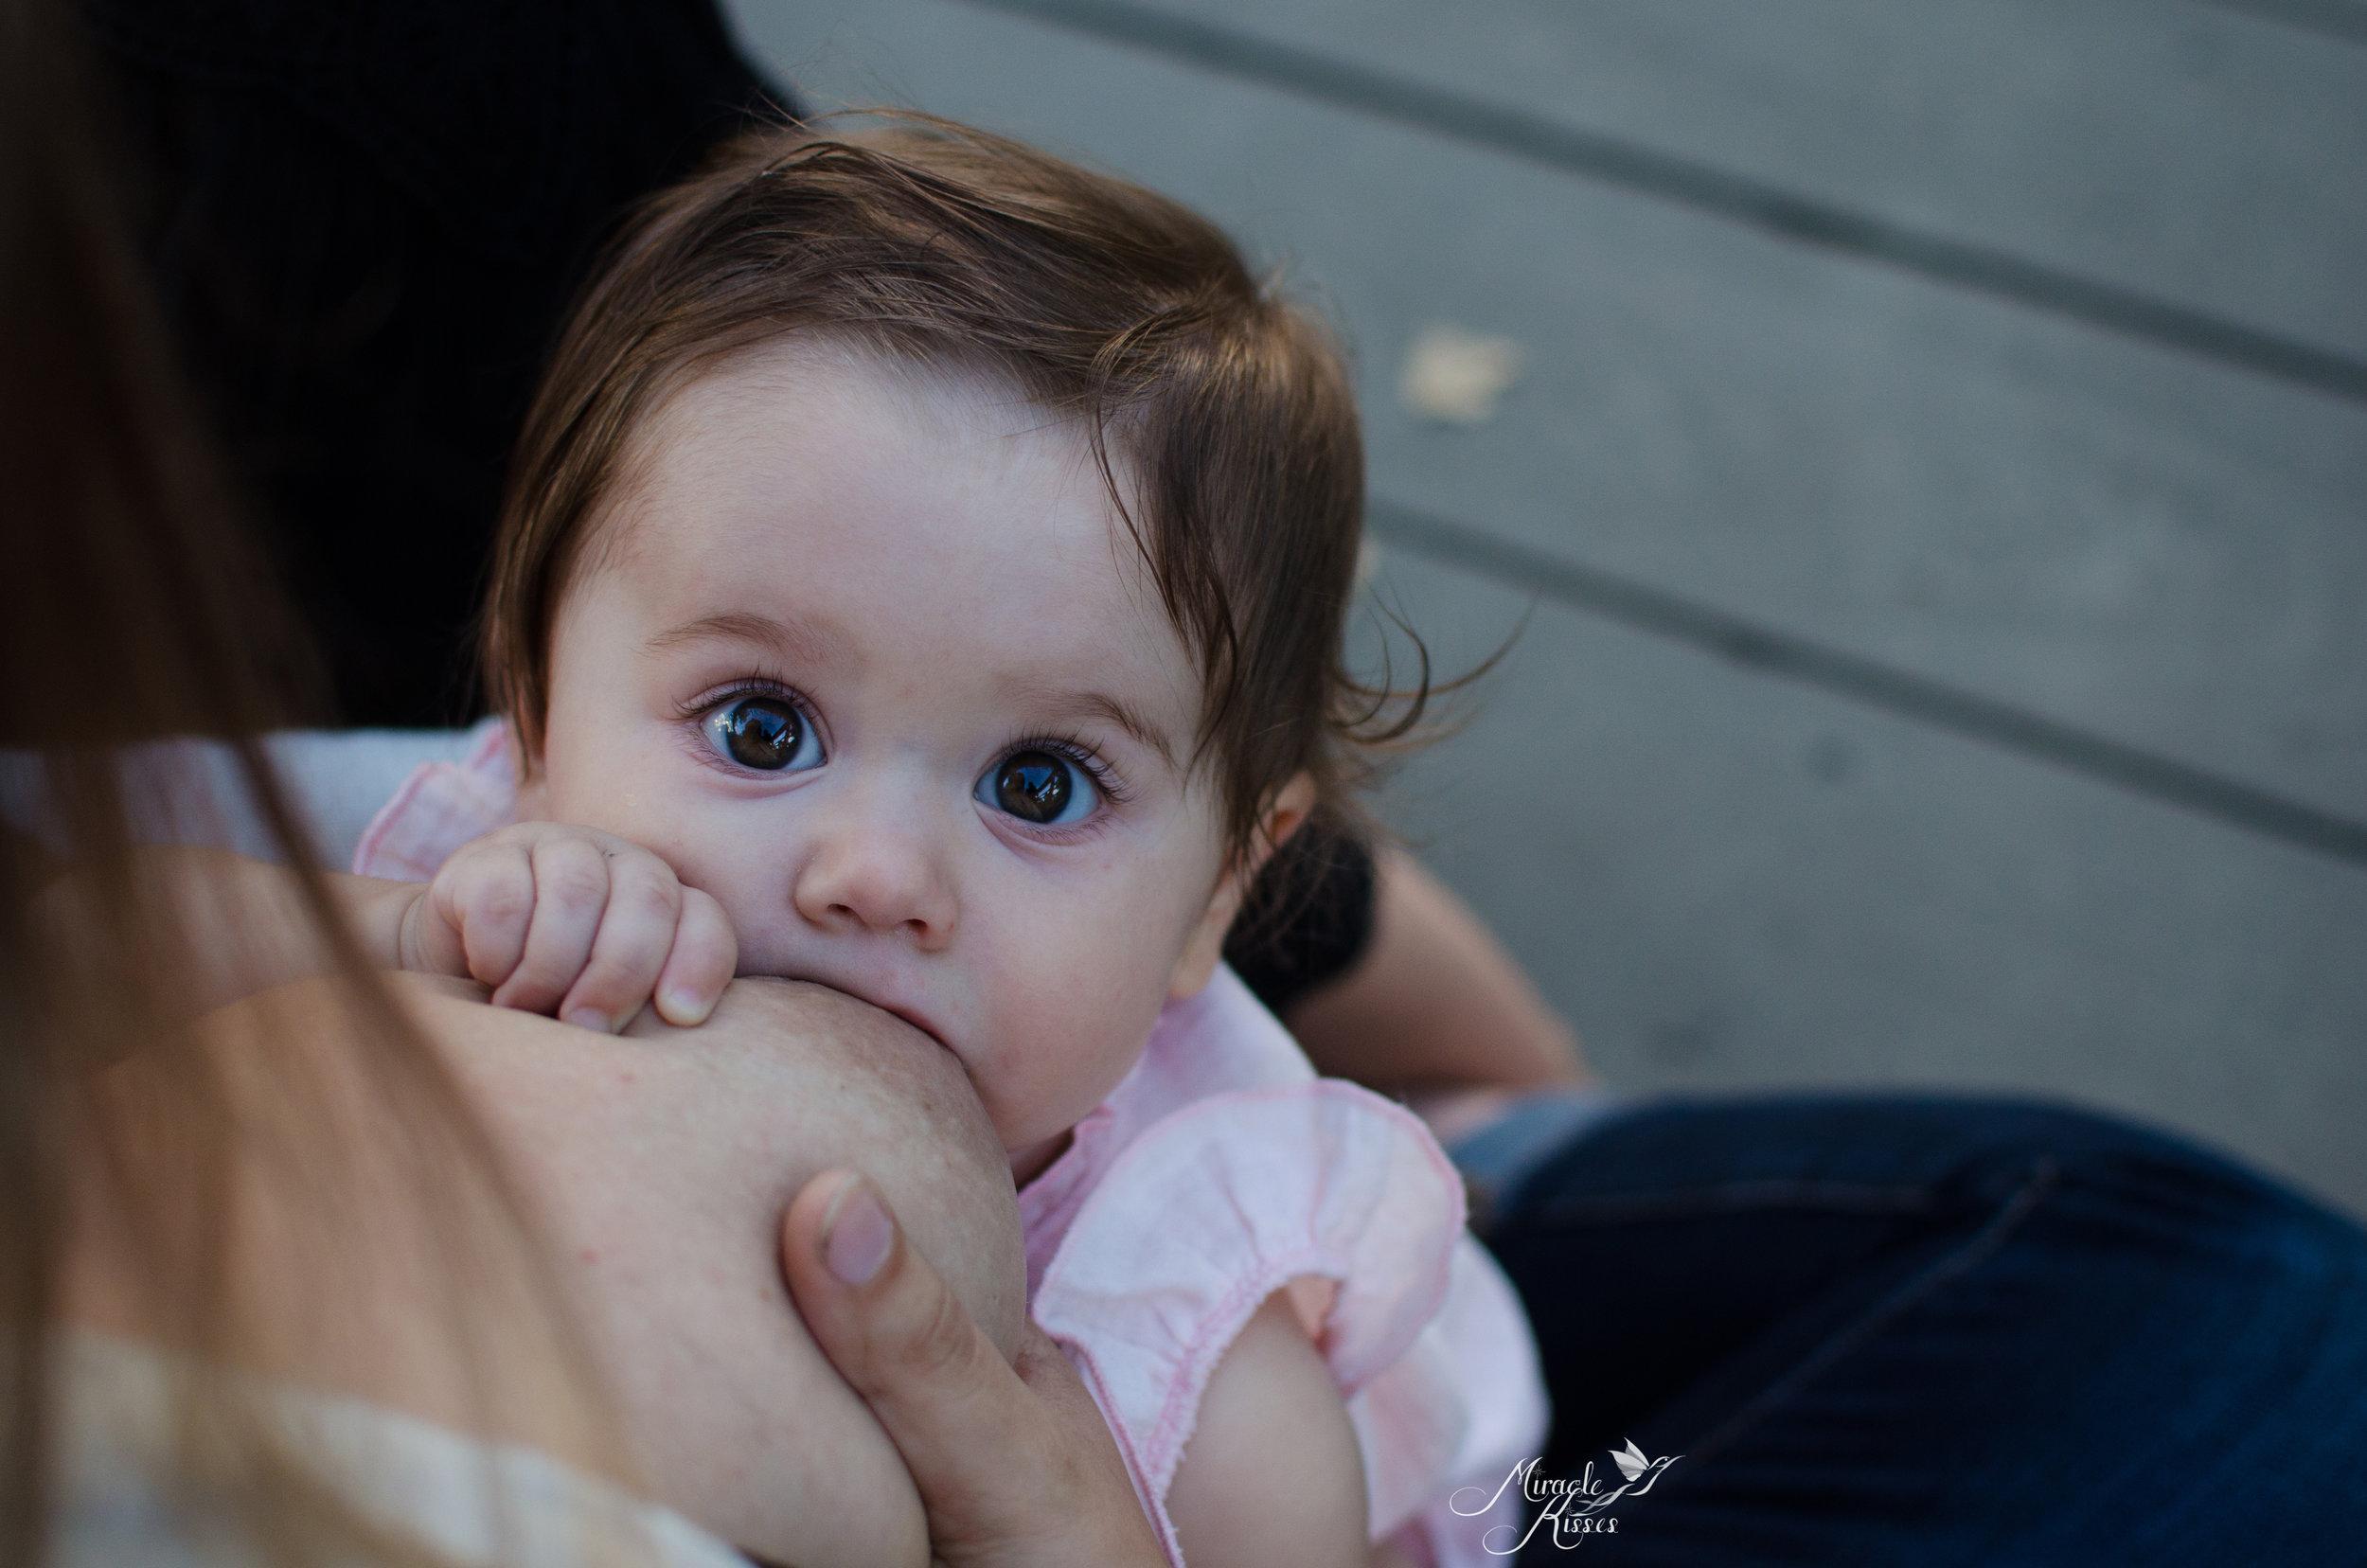 brown eyed beauty, acrobatic nursing, wheat ridge breastfeeding